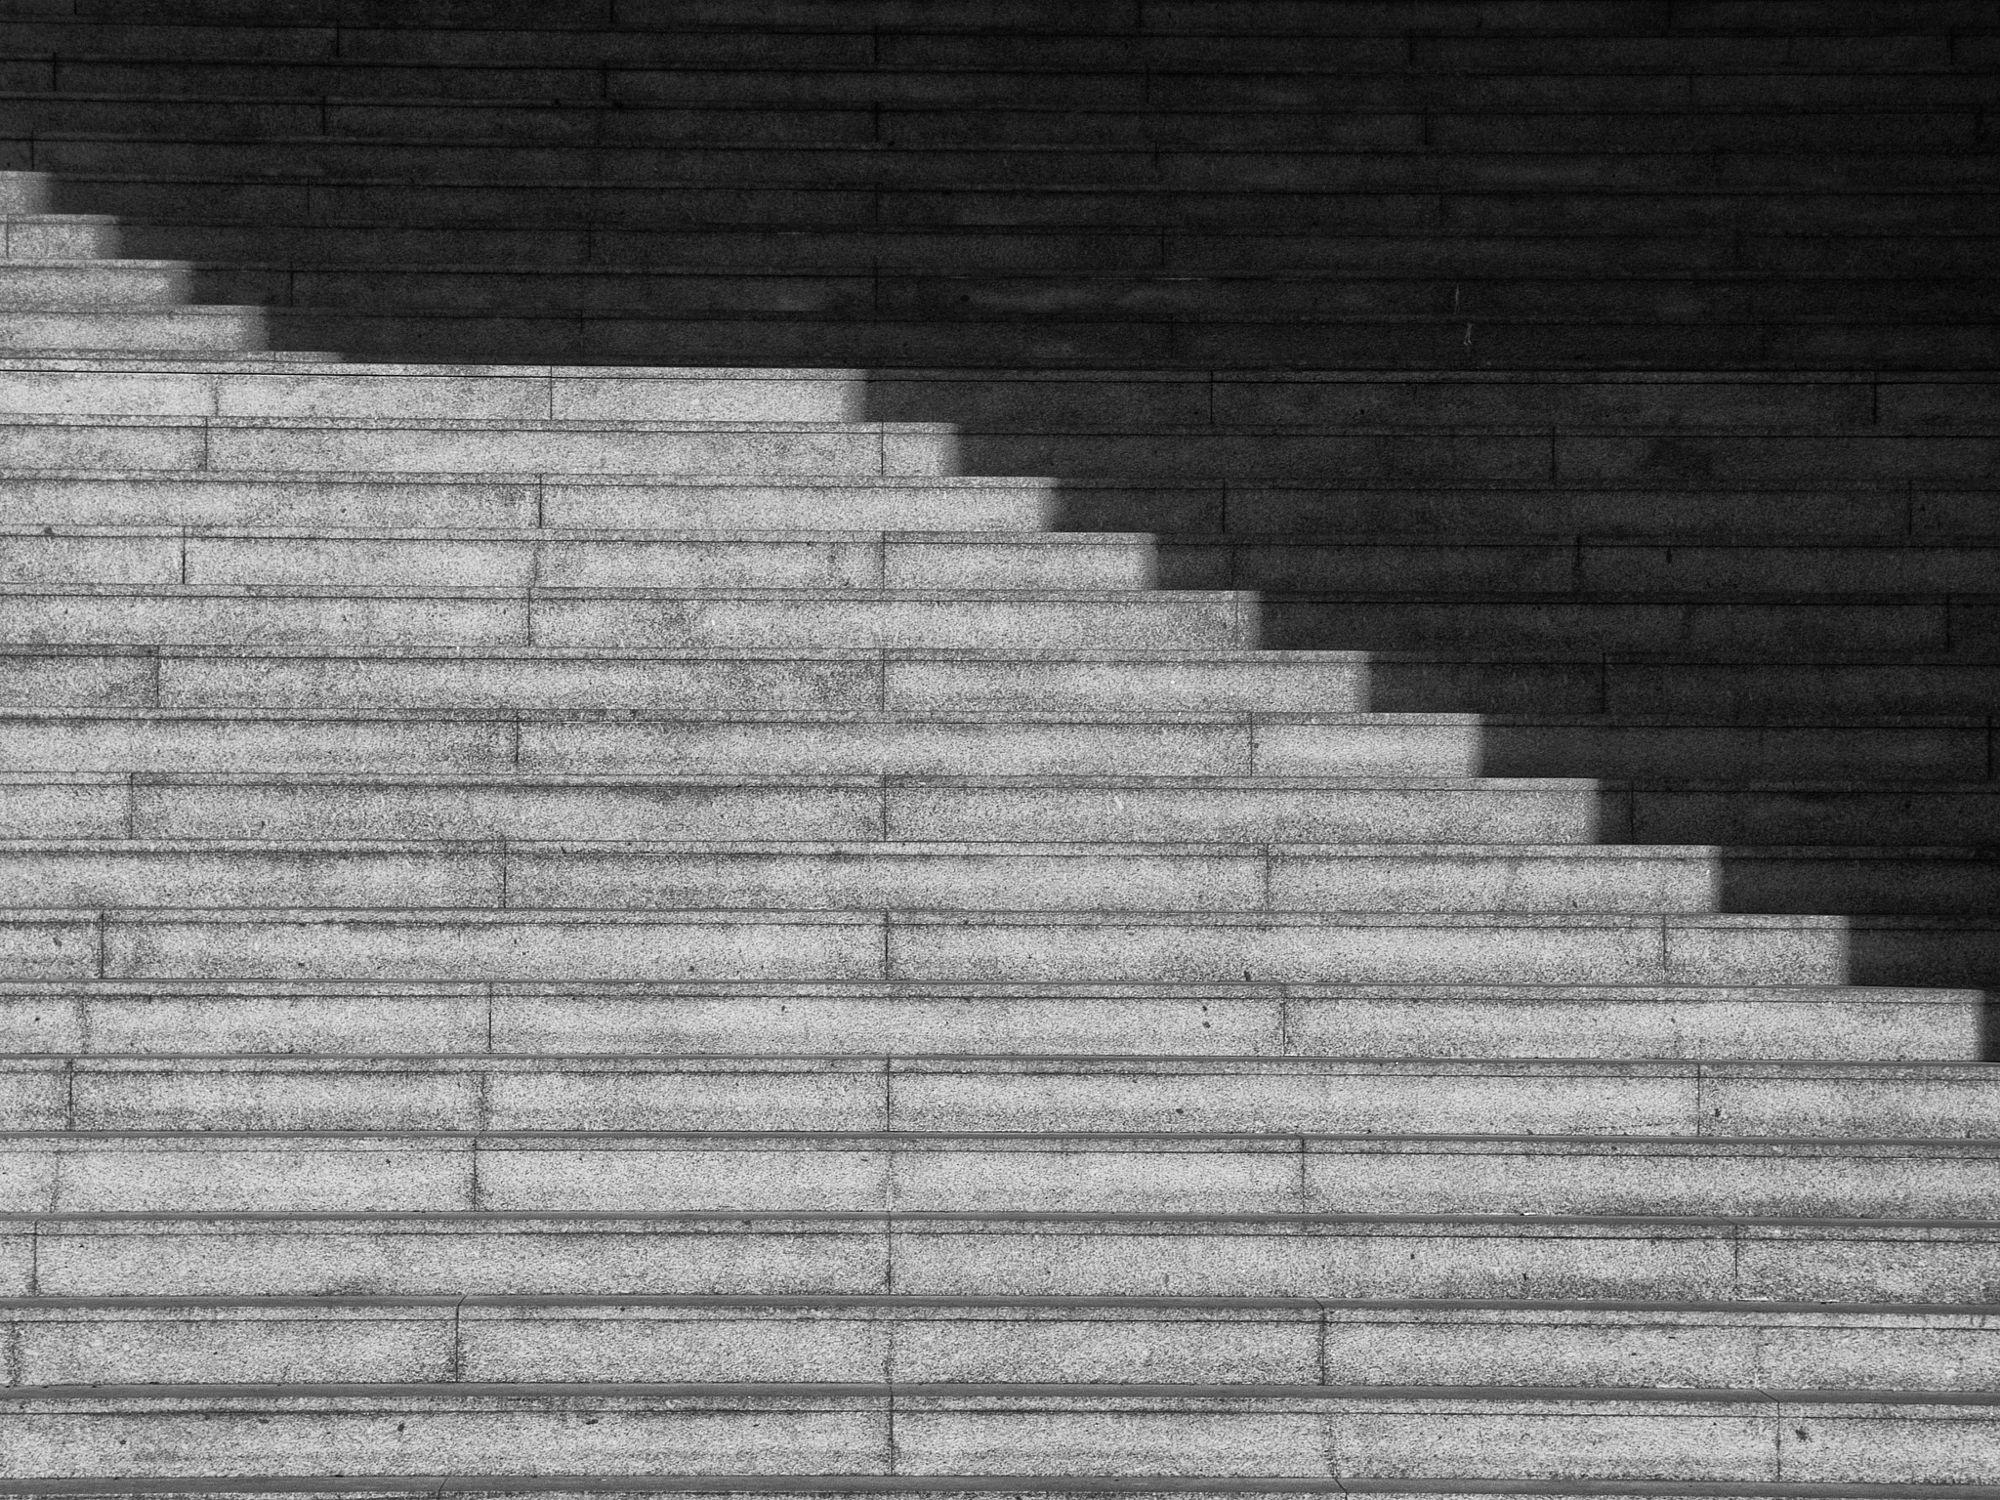 Masonry Steps